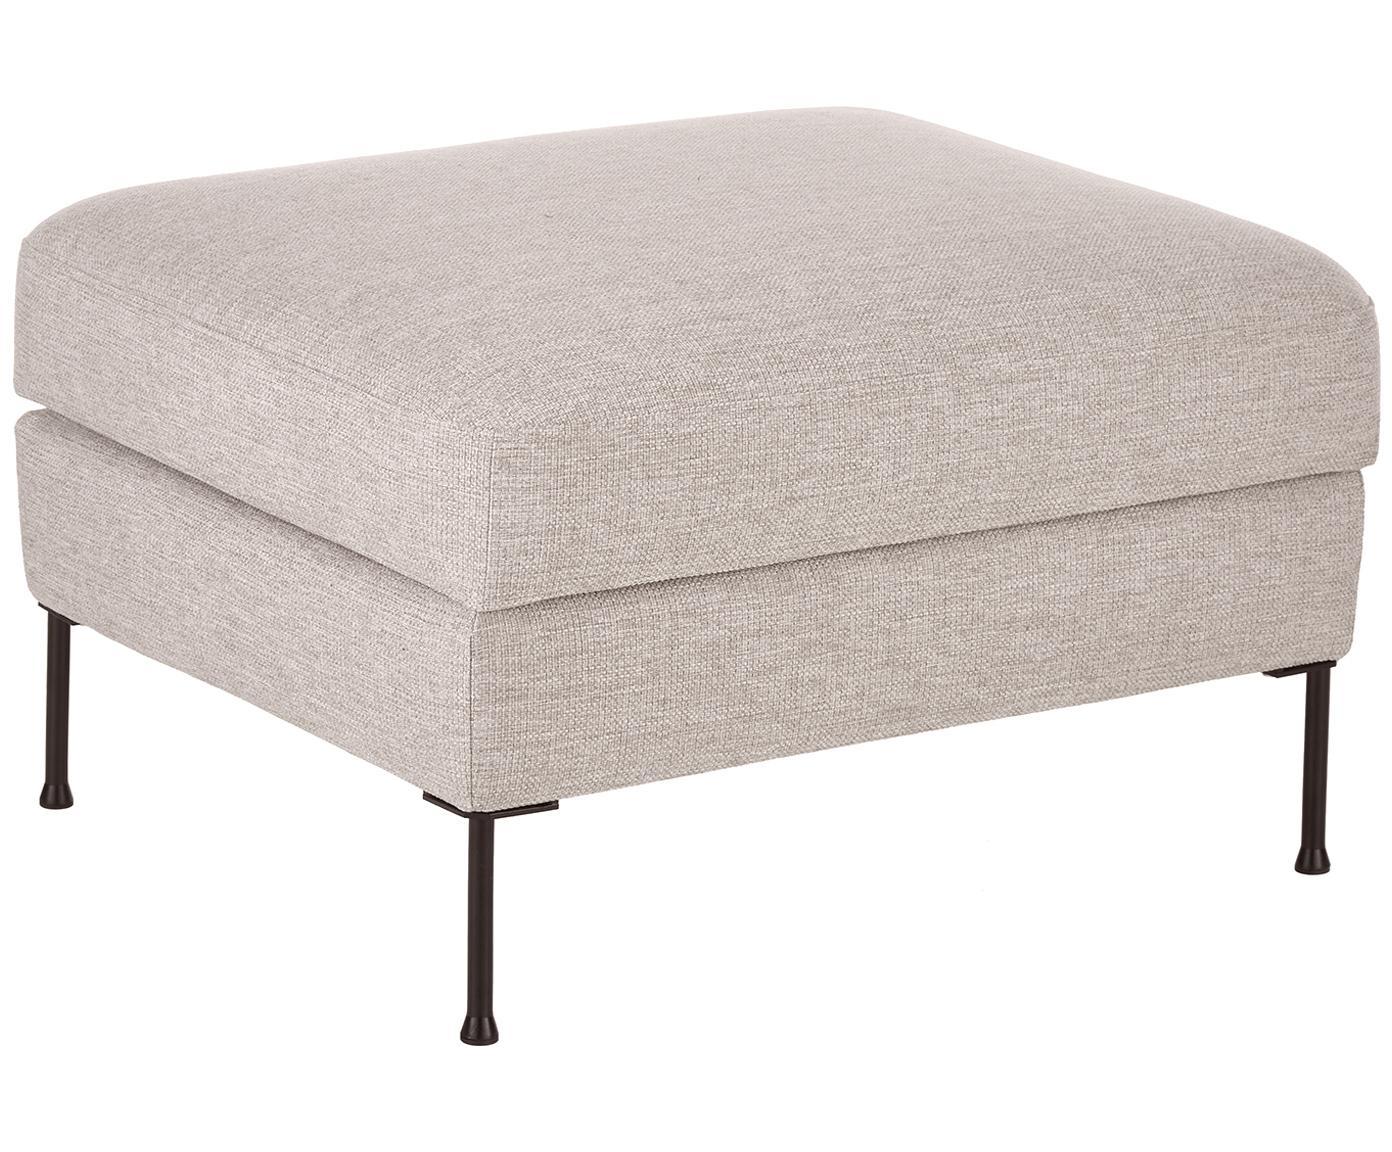 Sofa-Hocker Cucita mit Stauraum, Bezug: Webstoff (Polyester) 100., Gestell: Massives Kiefernholz, Füße: Metall, lackiert, Beige, 85 x 42 cm